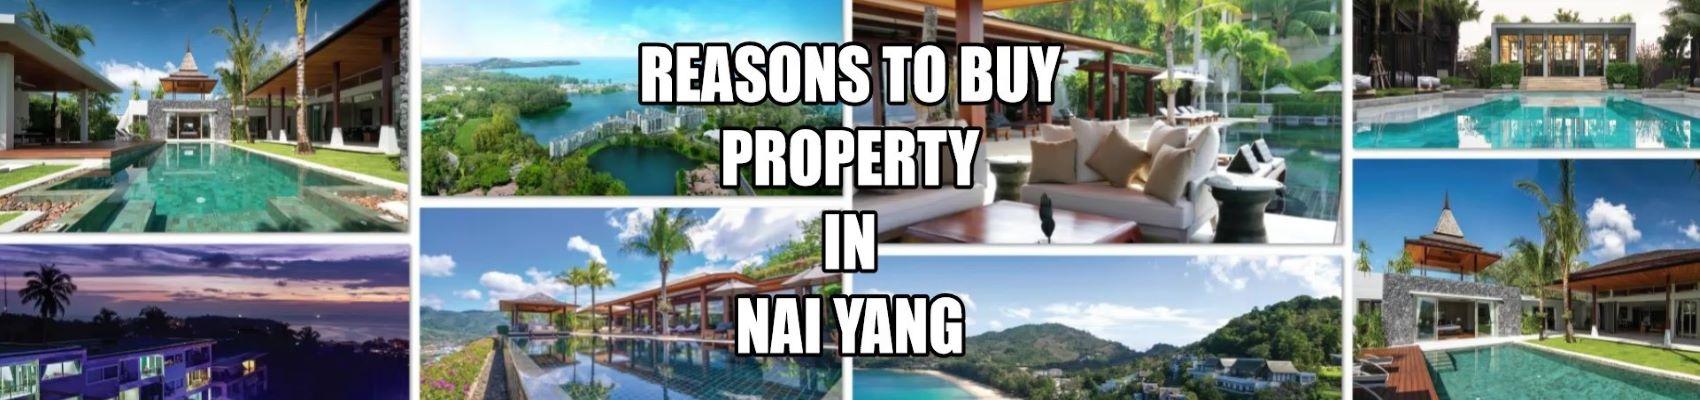 Reasons why to purchase in Nai Yang